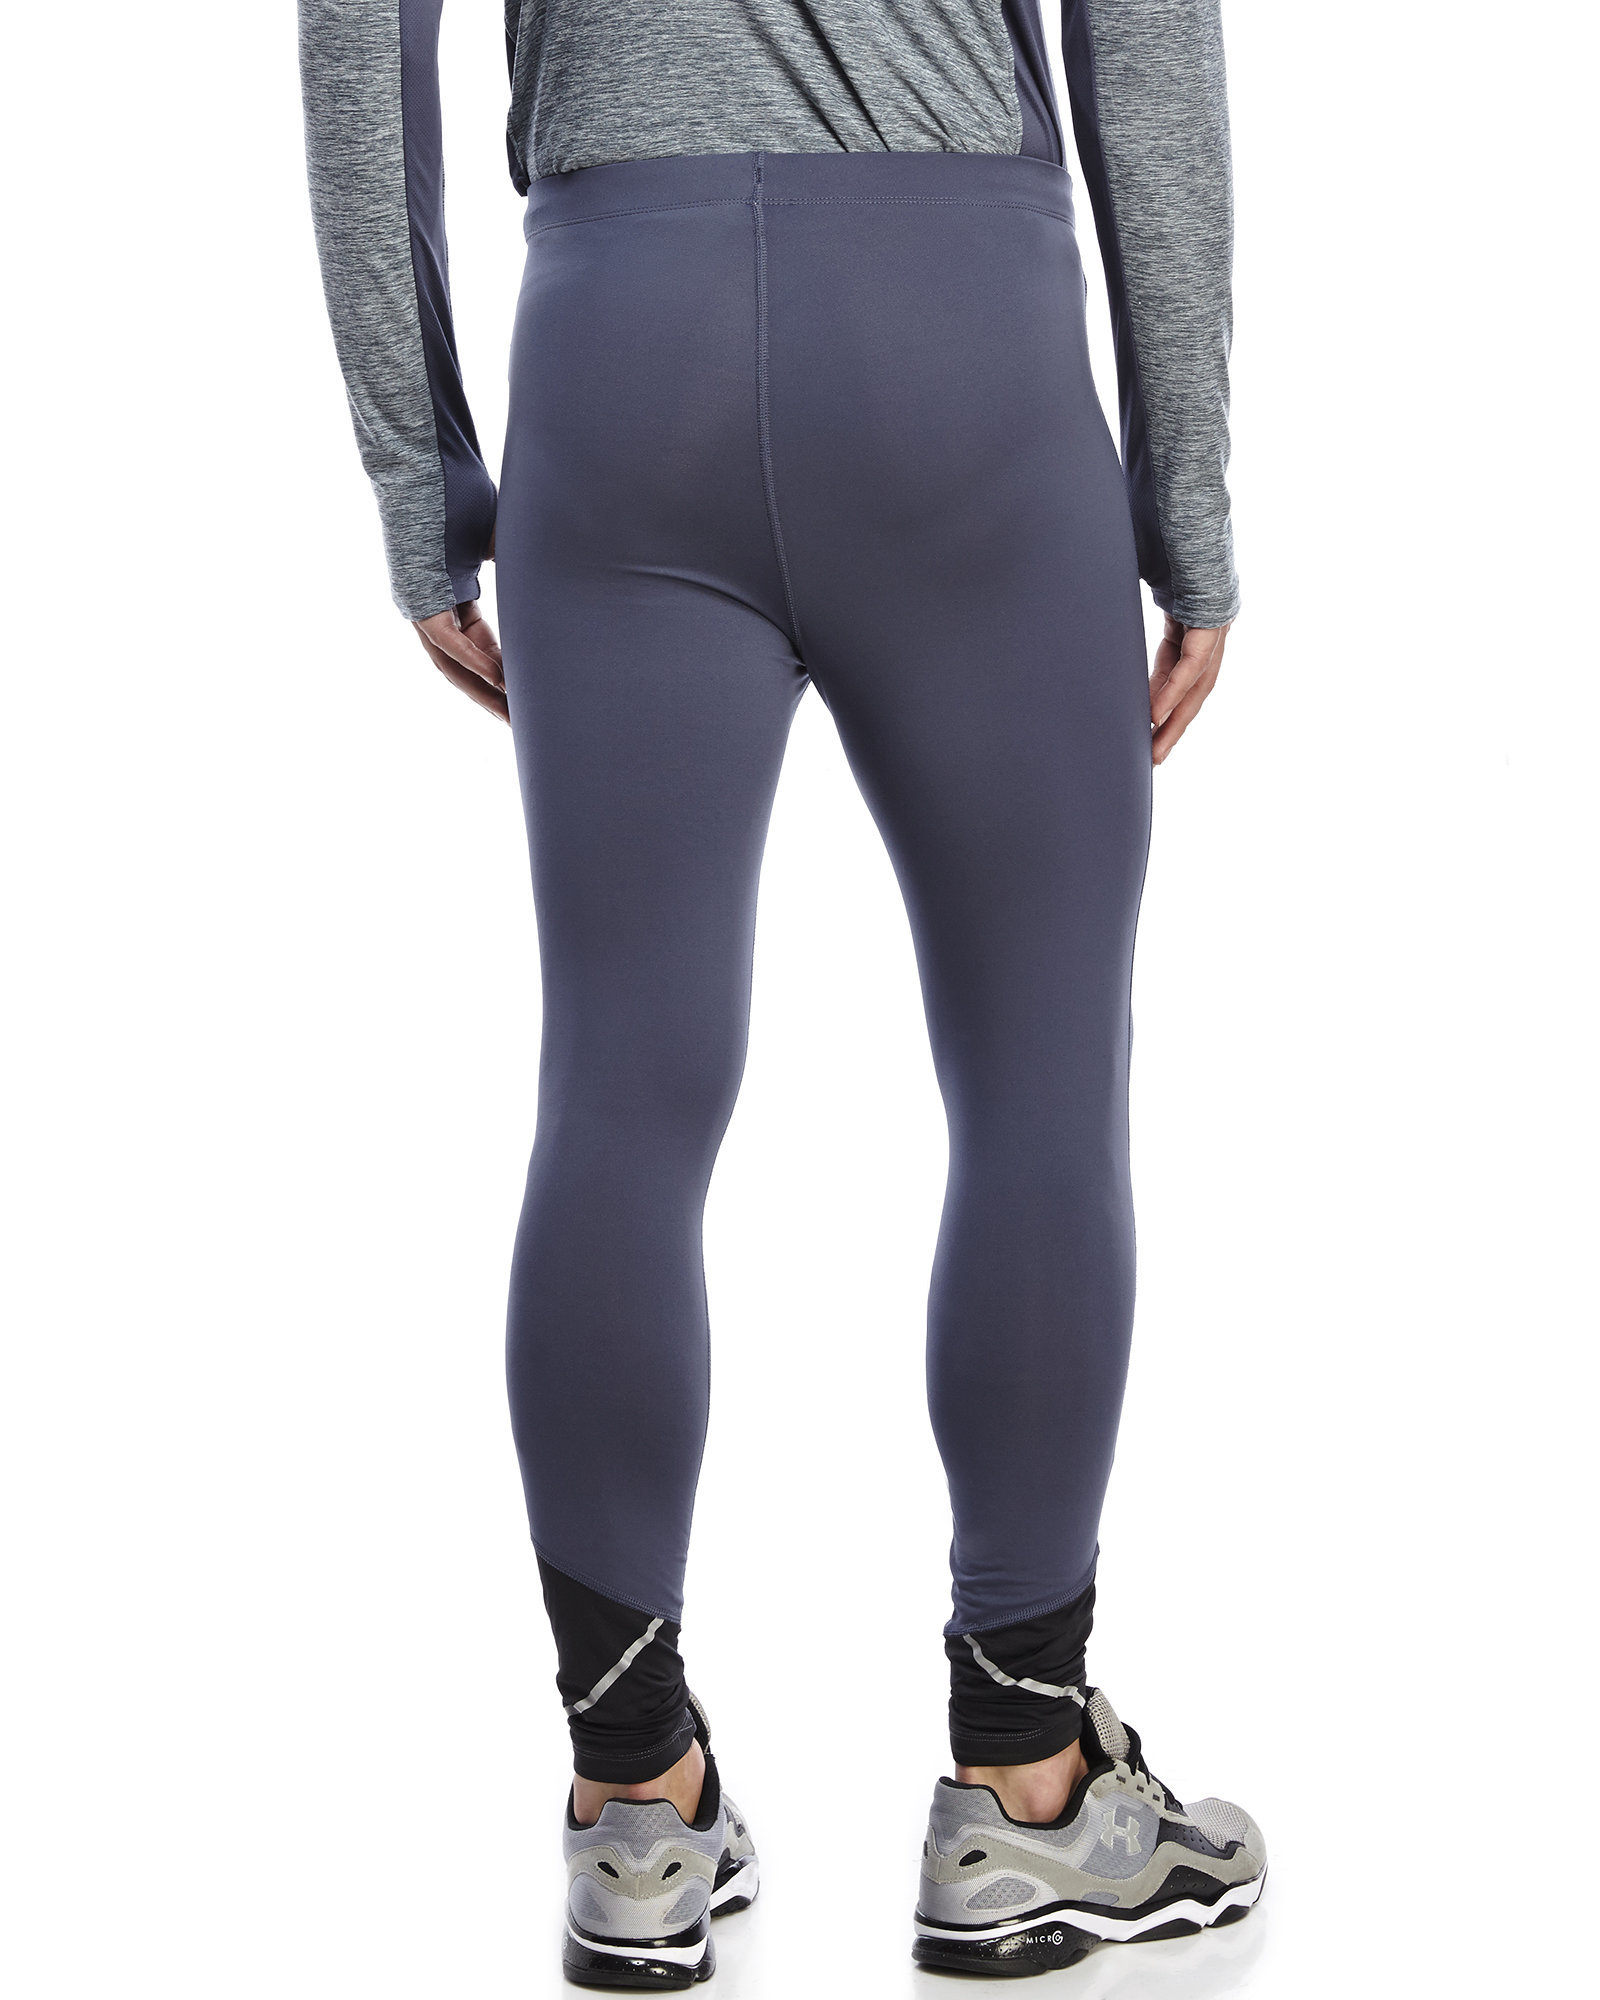 64a30b4a3e New Balance Blue Impact Running Tights for men